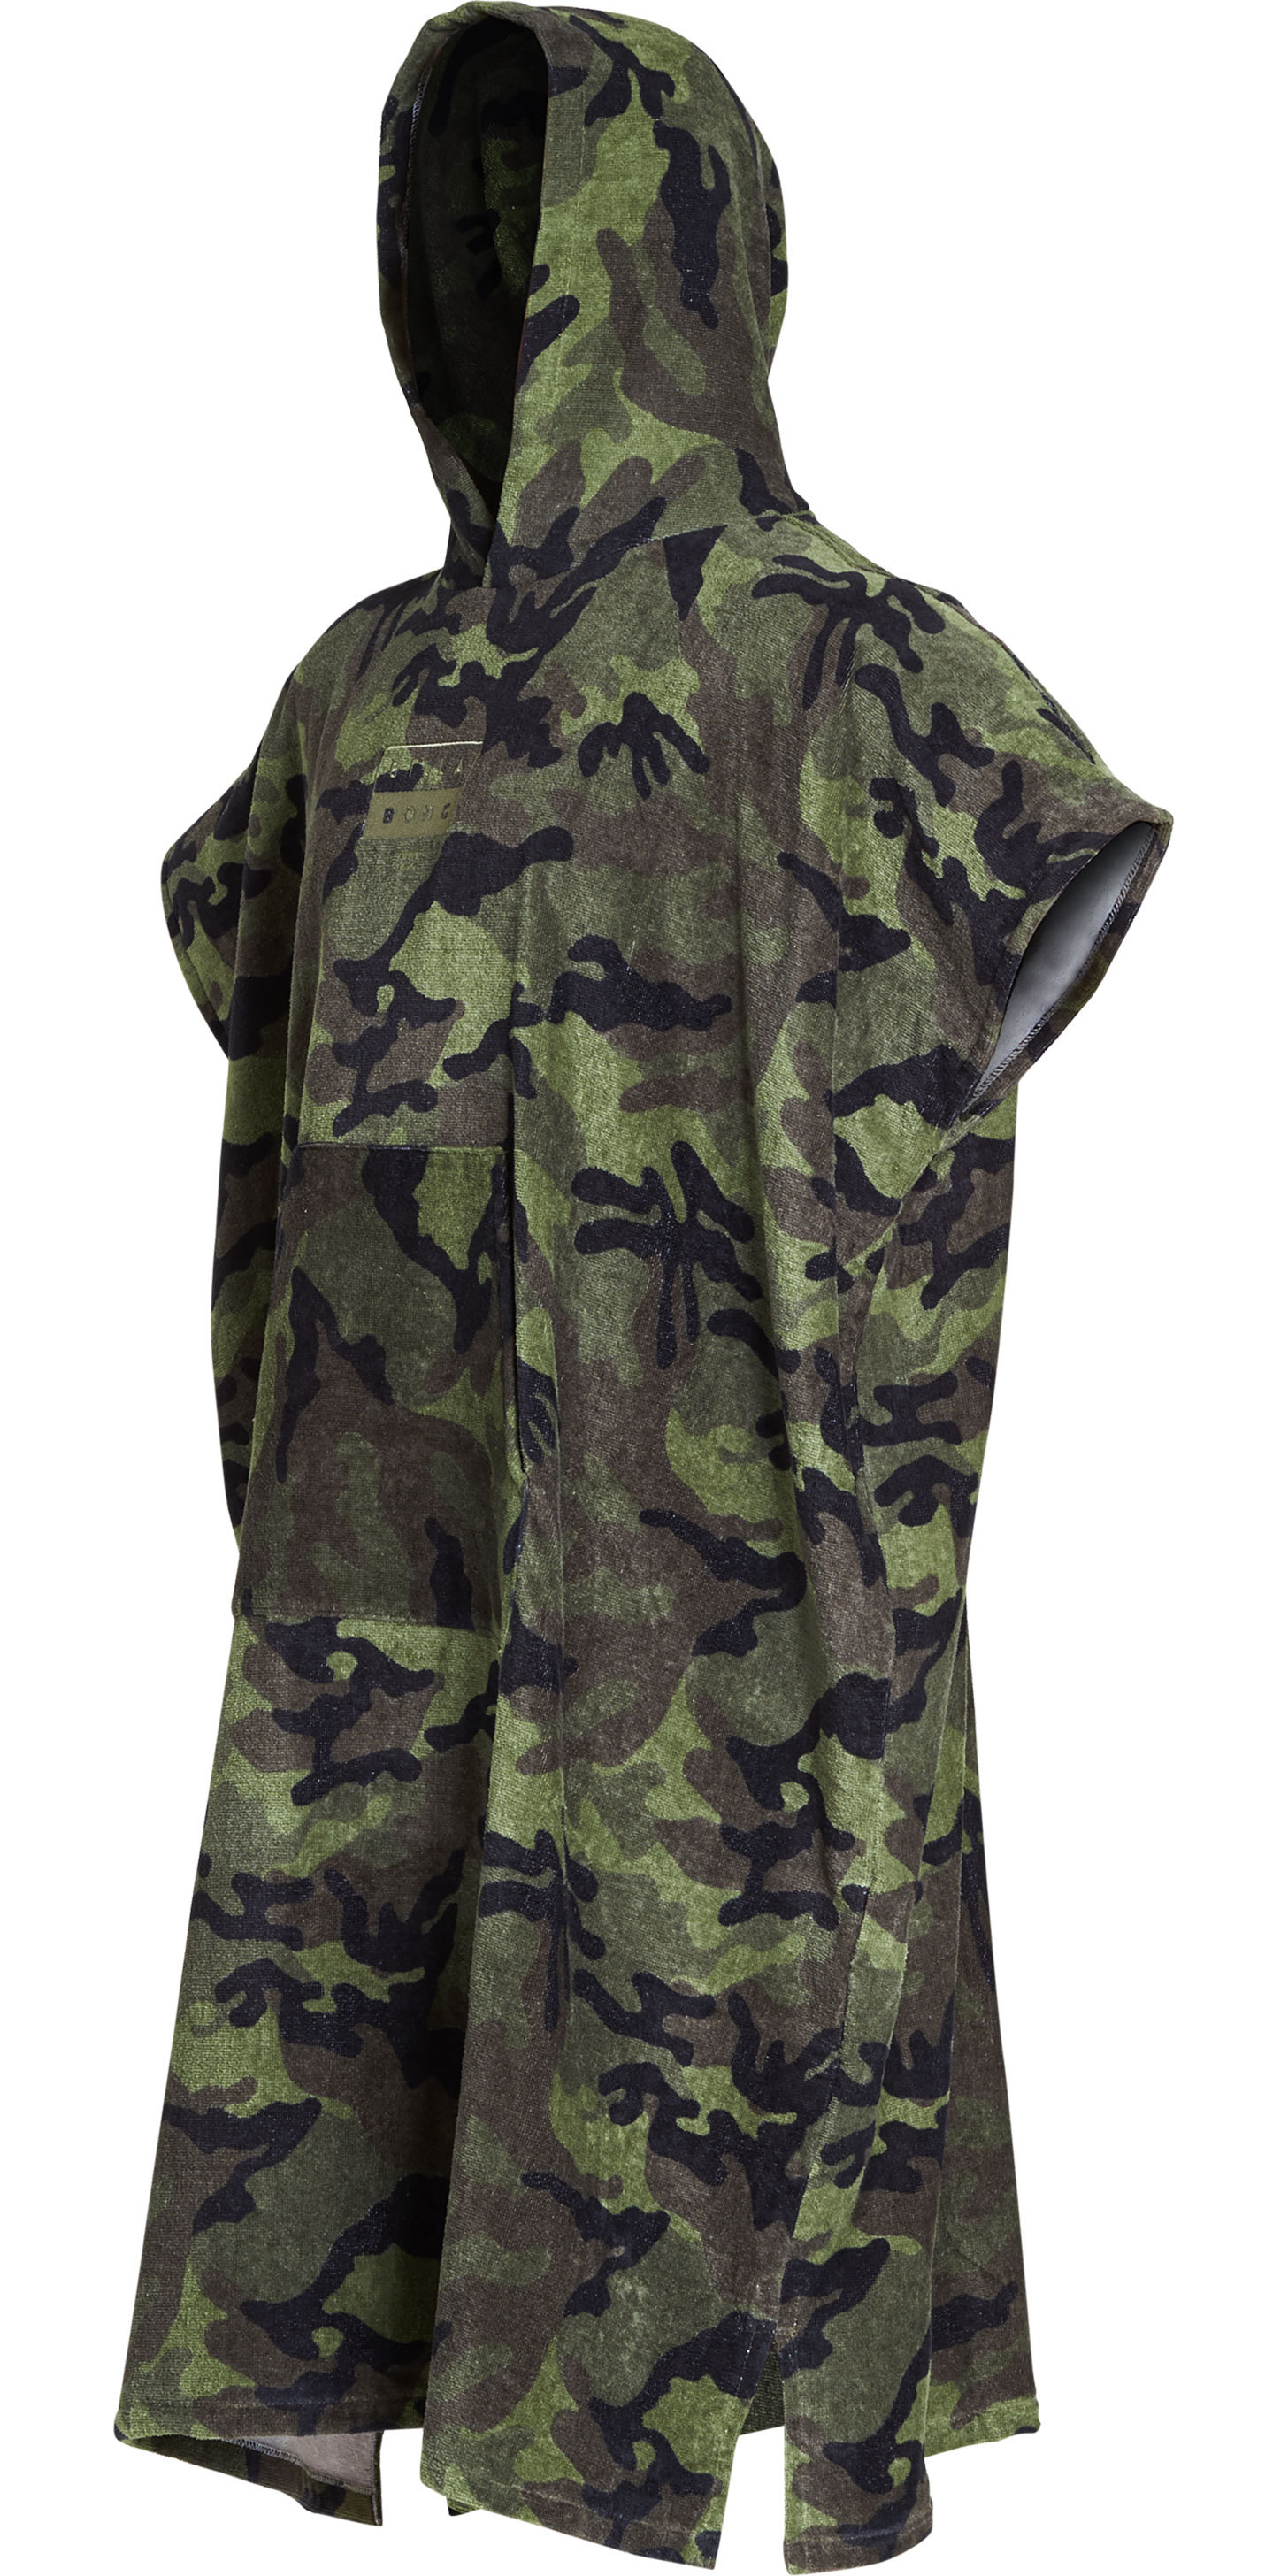 2019 Billabong Mens Hooded Changing Robe / Poncho Camo N4BR01